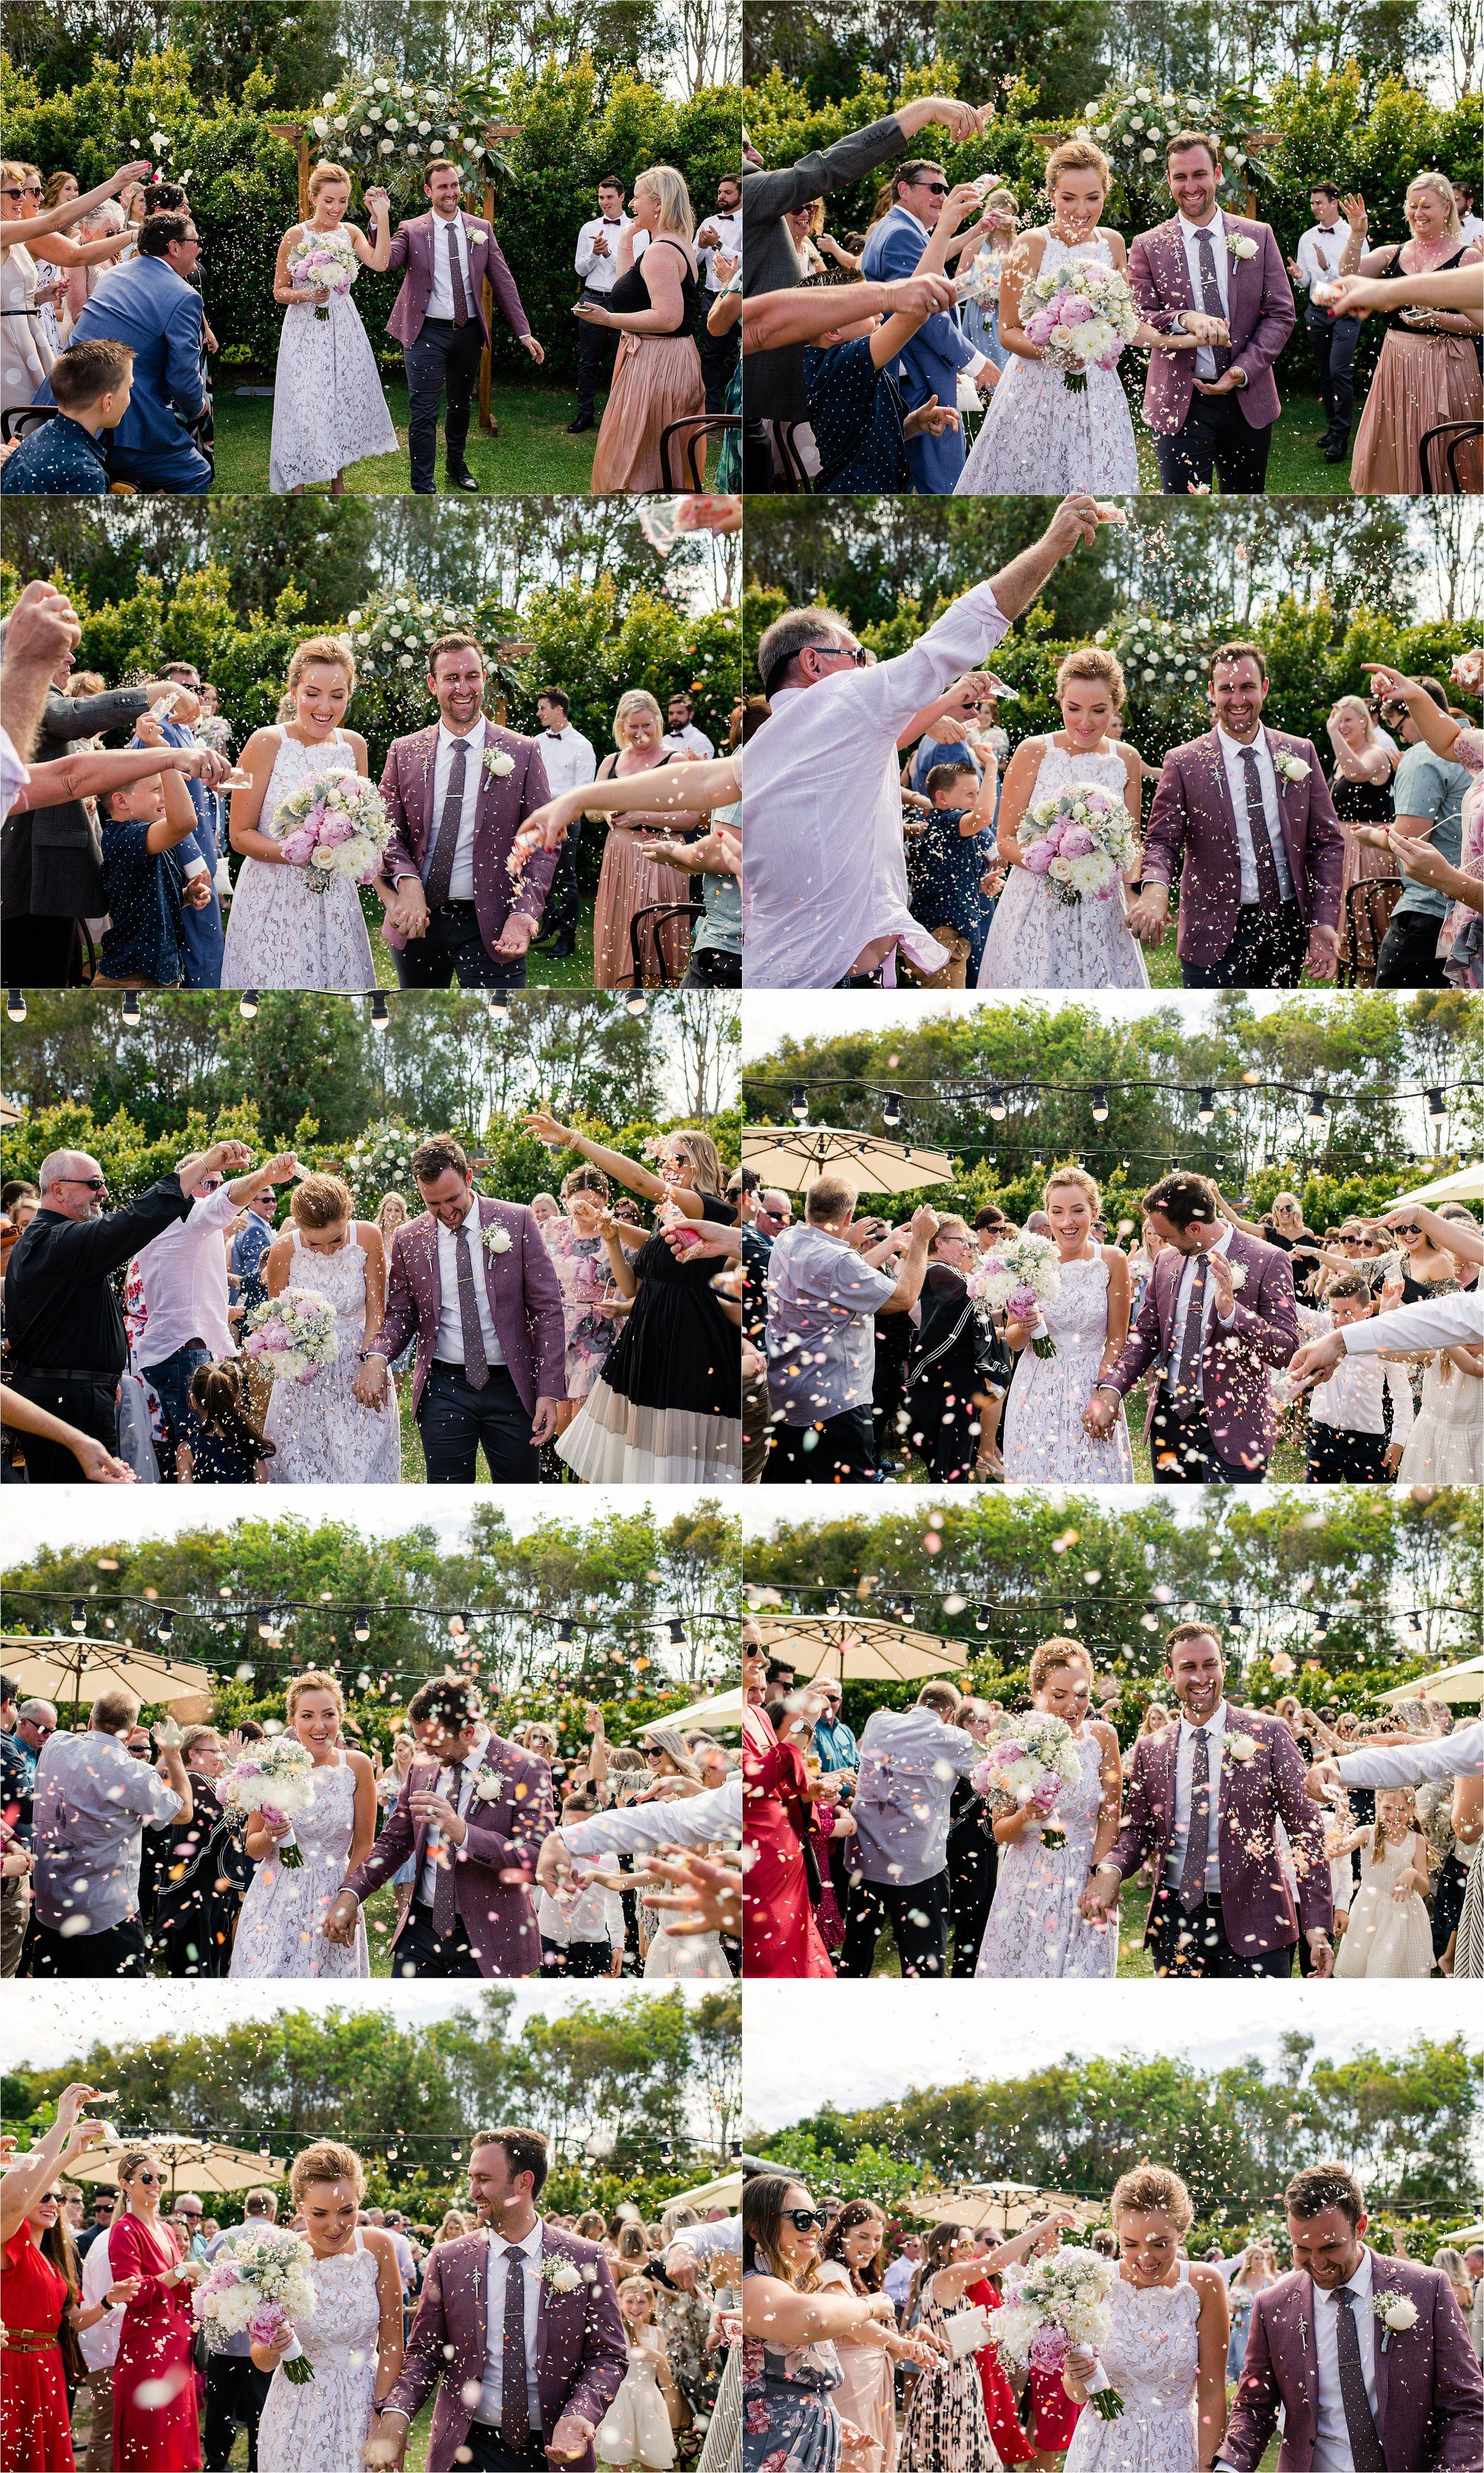 Garden-Ceremony-Wedding_0019.jpg